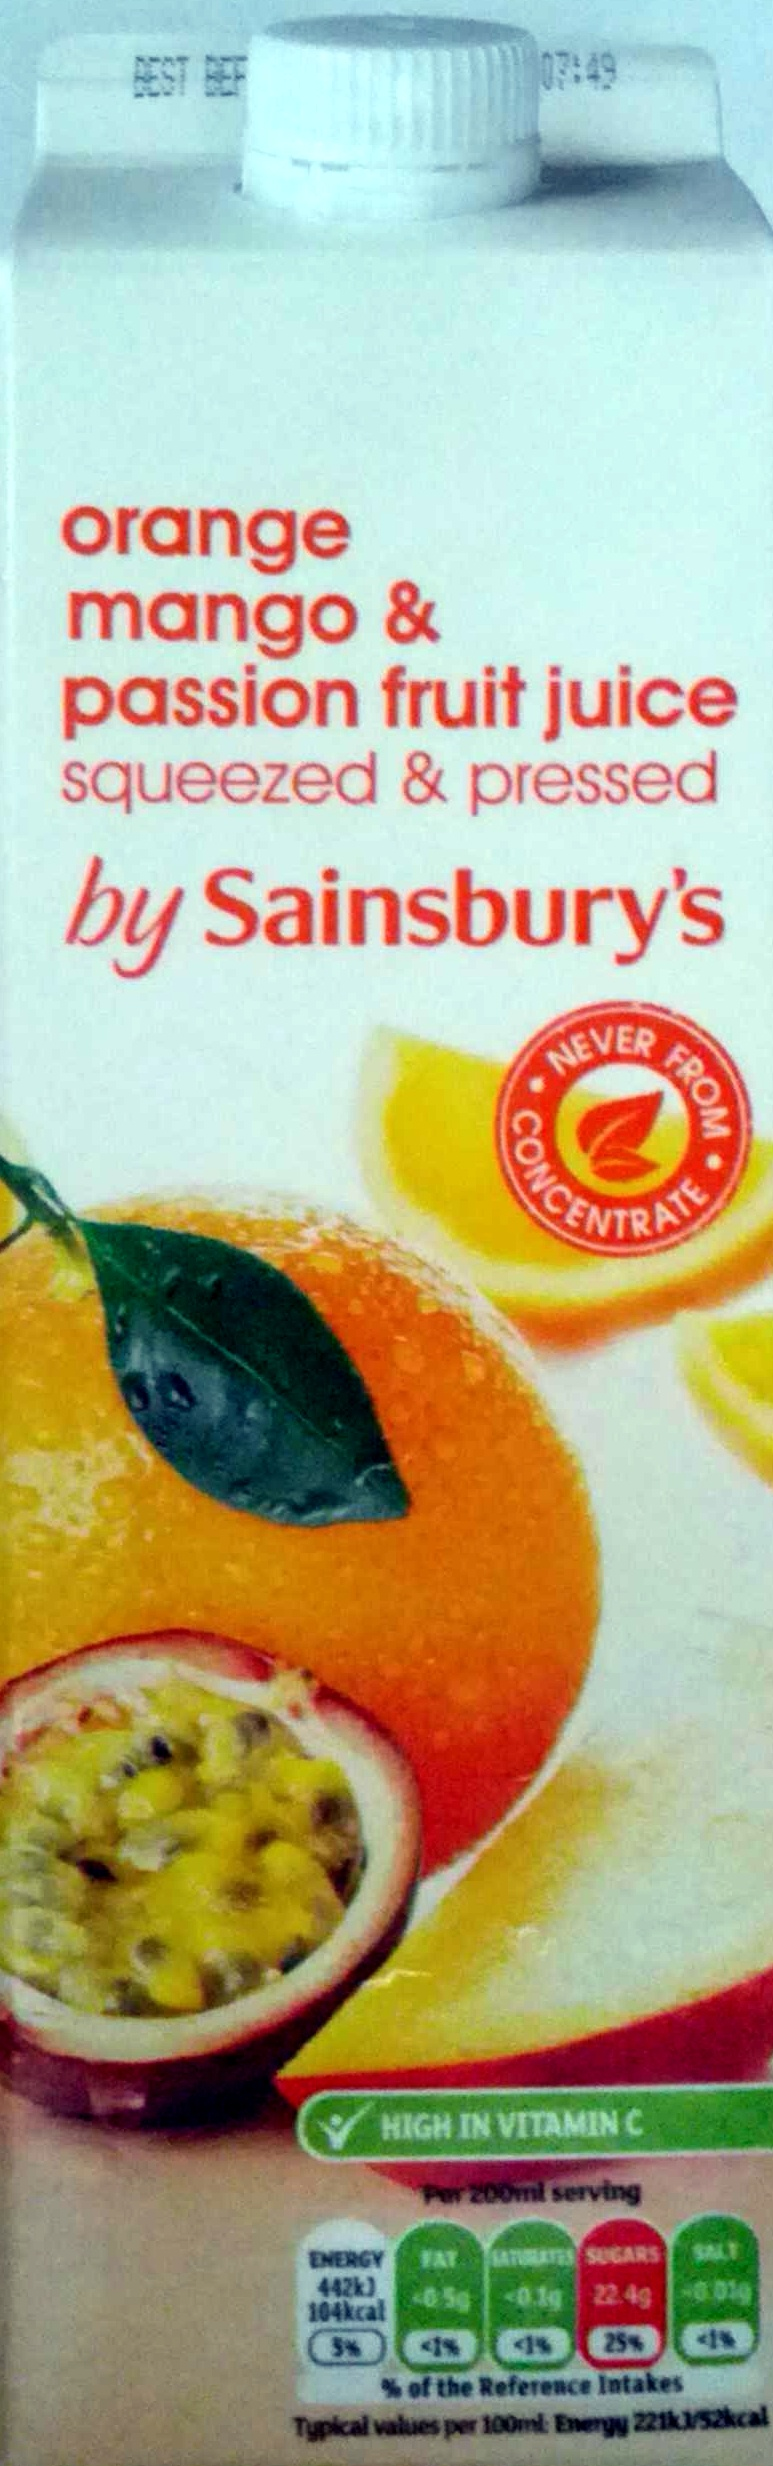 Orange, mango & passion fruit juice squeezed and pressed - Produit - en